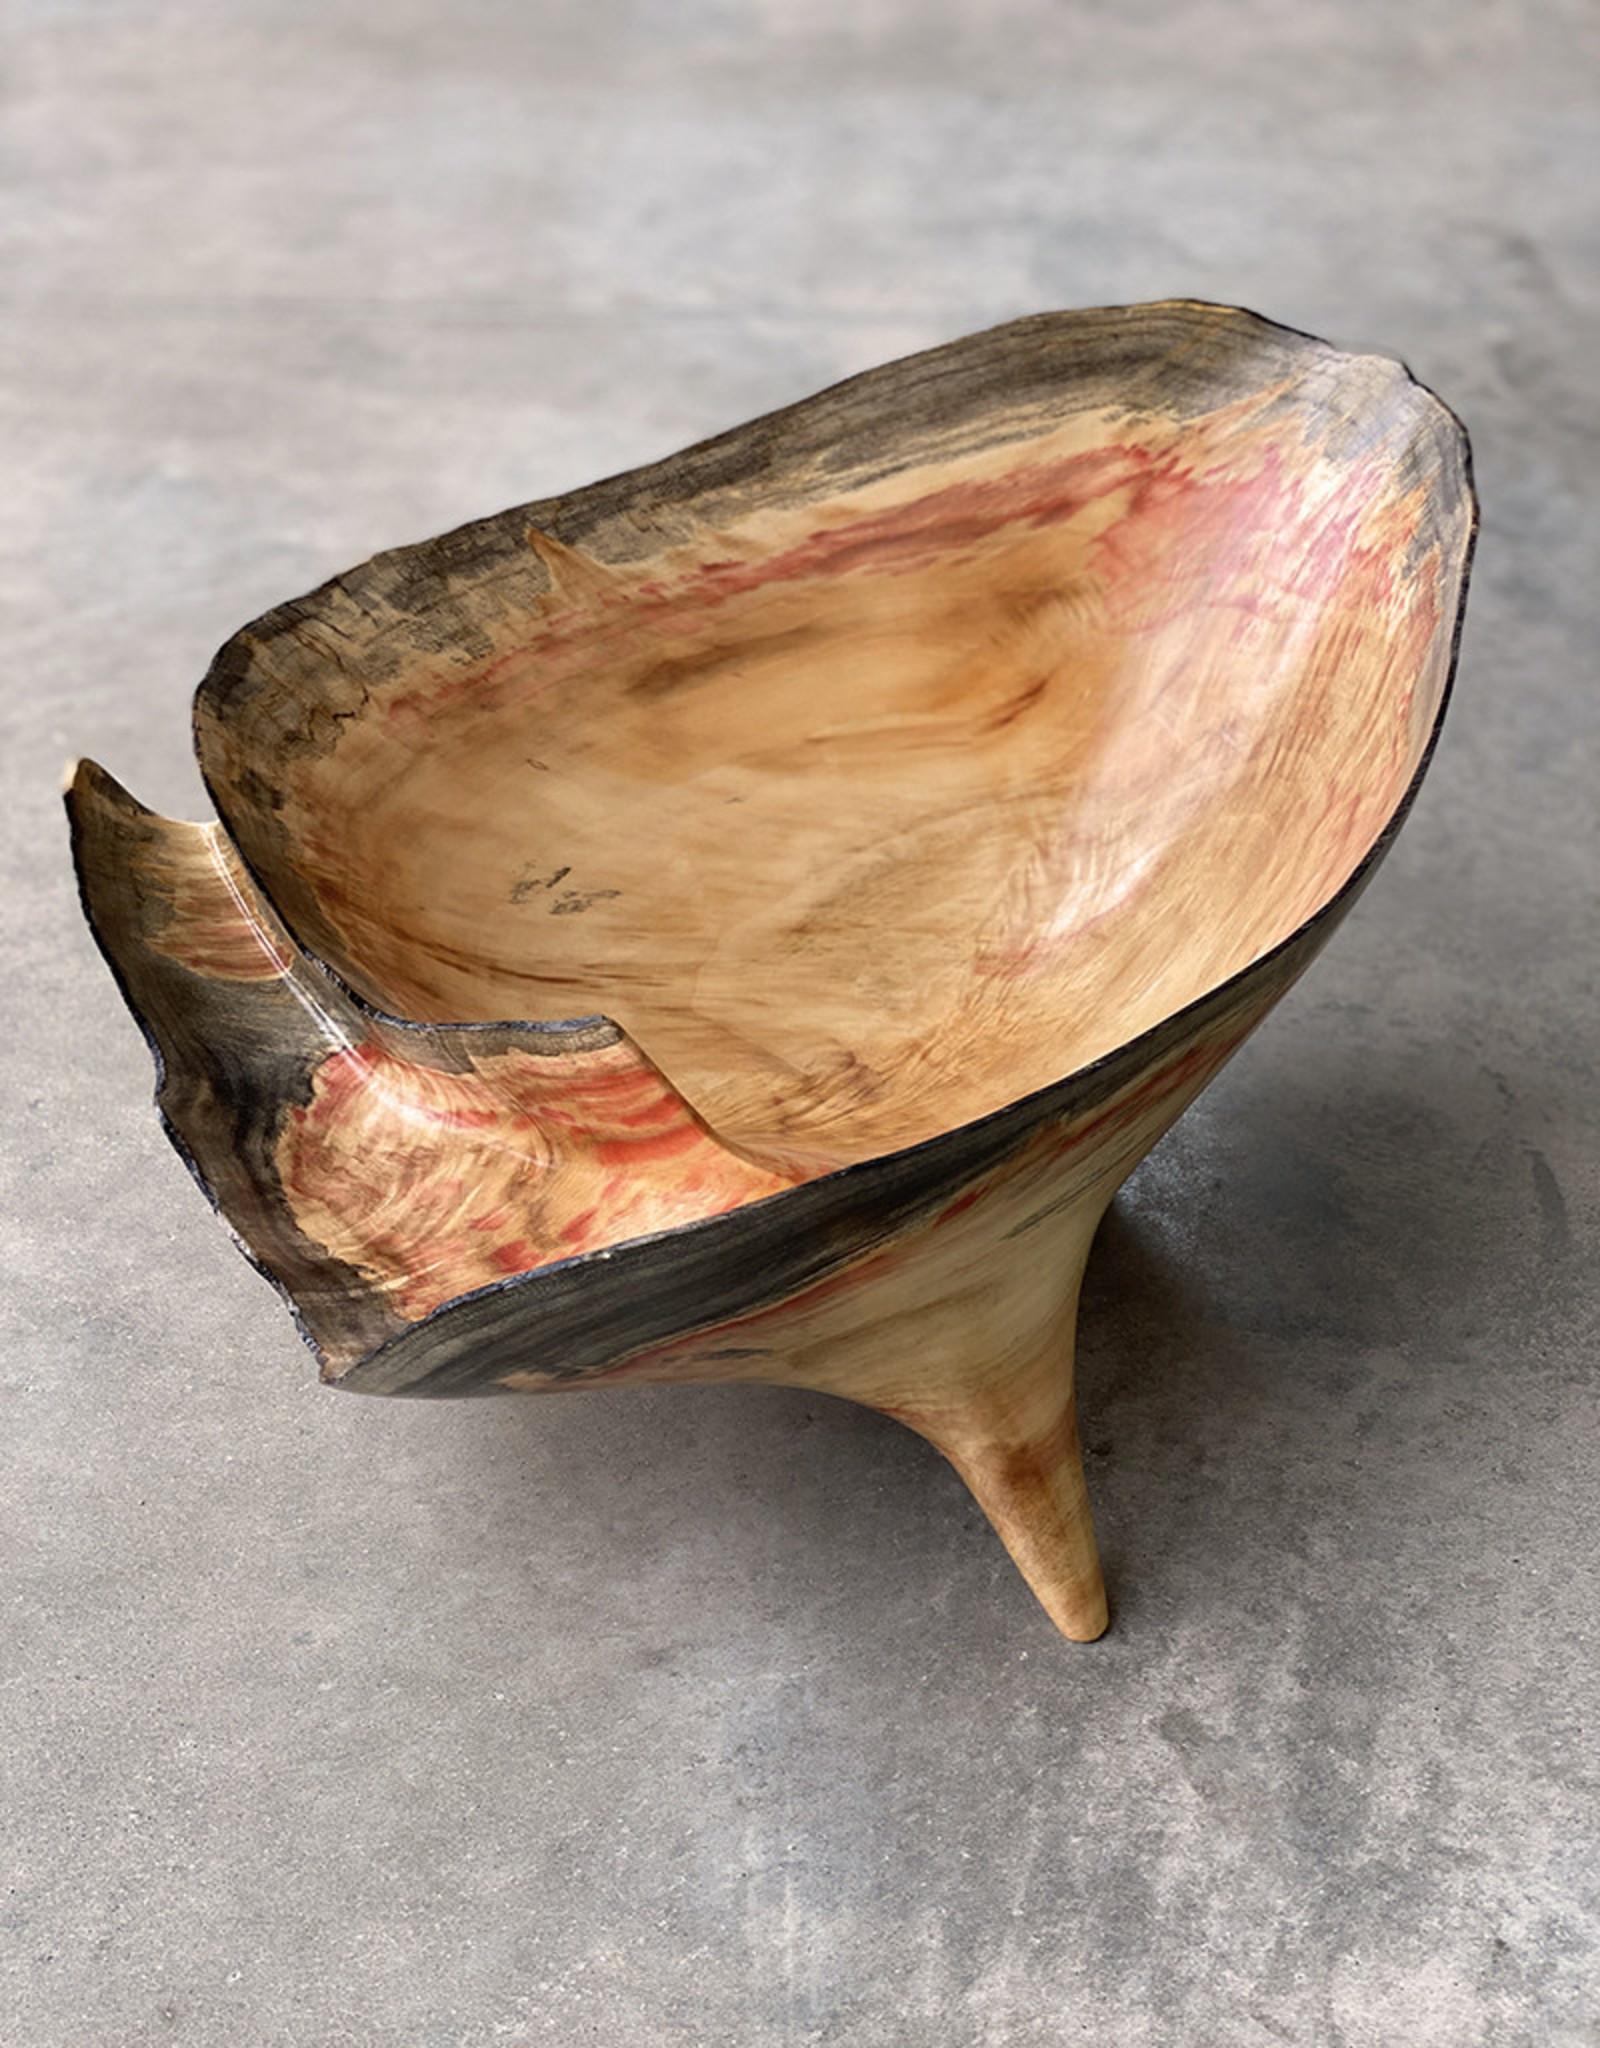 Resurrected Woodworks #90 // Matt Roman